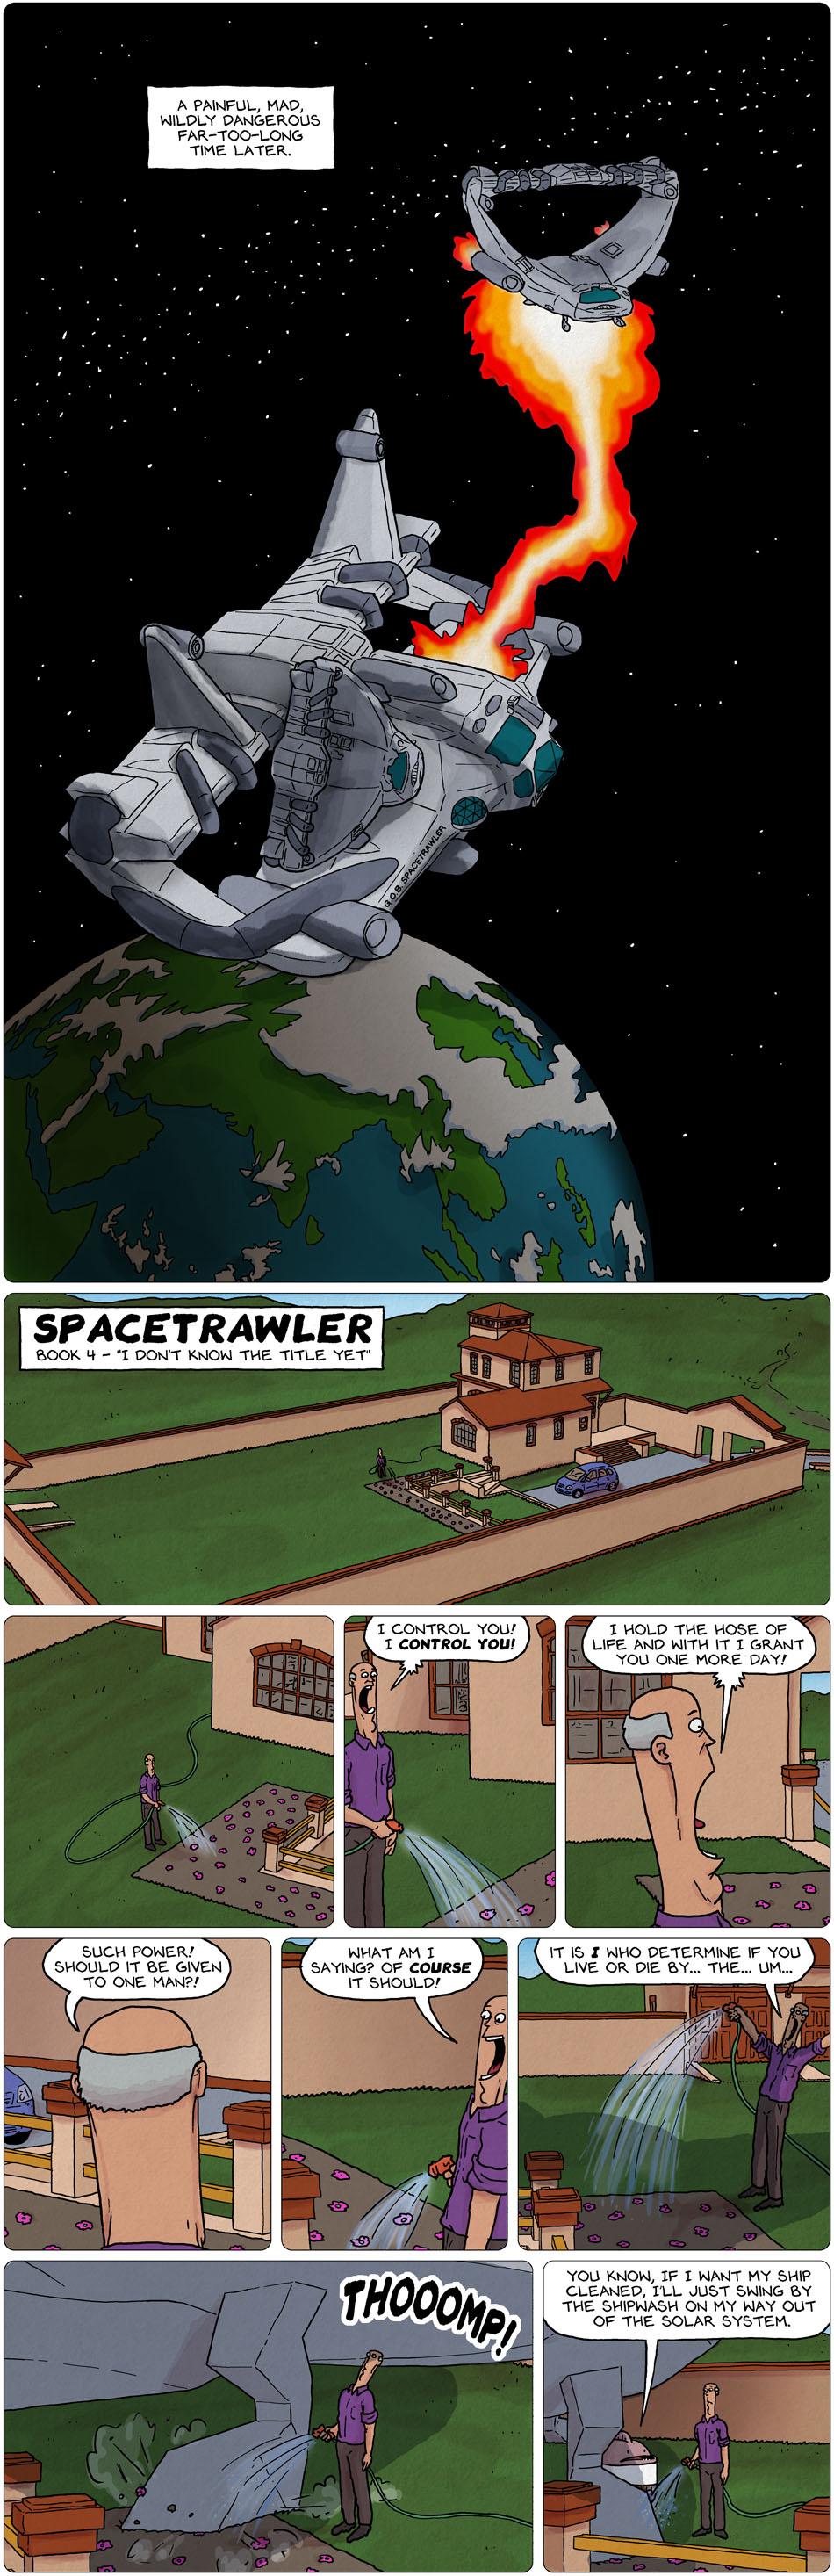 2016-08-24-spacetrawler4